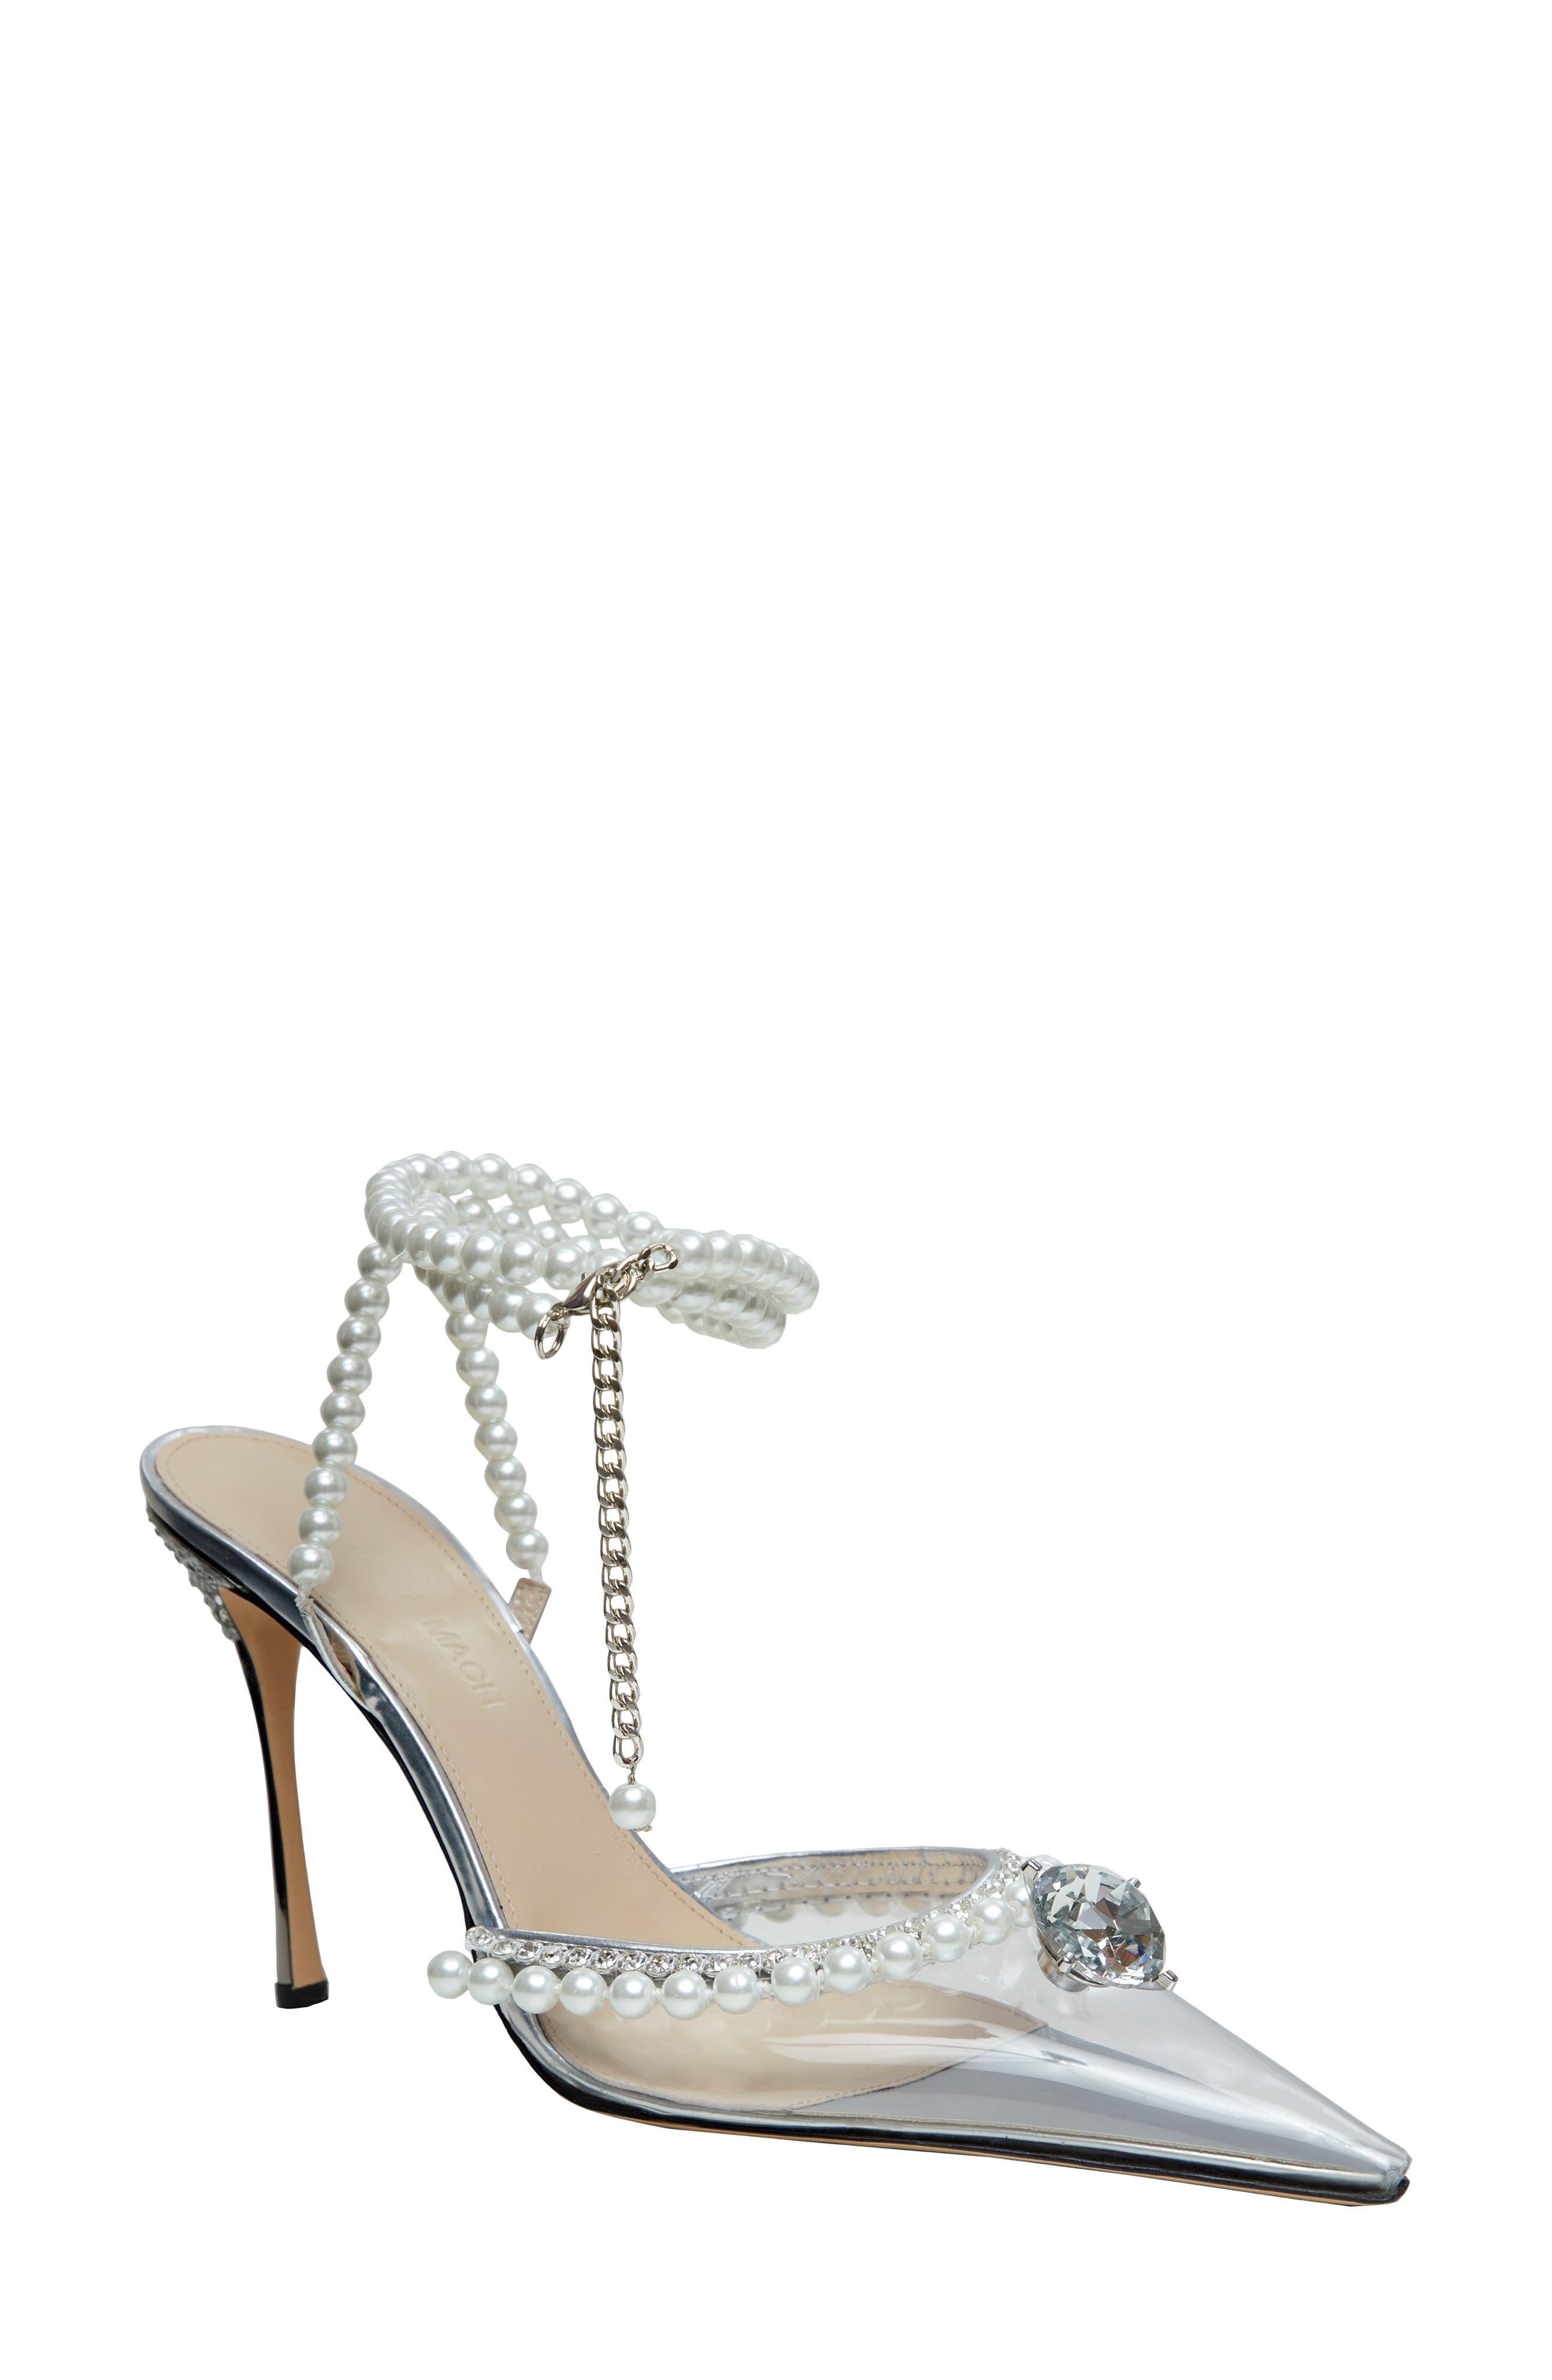 Diamond Of Elizabeth Imitation Pearl Pointed Toe Pump